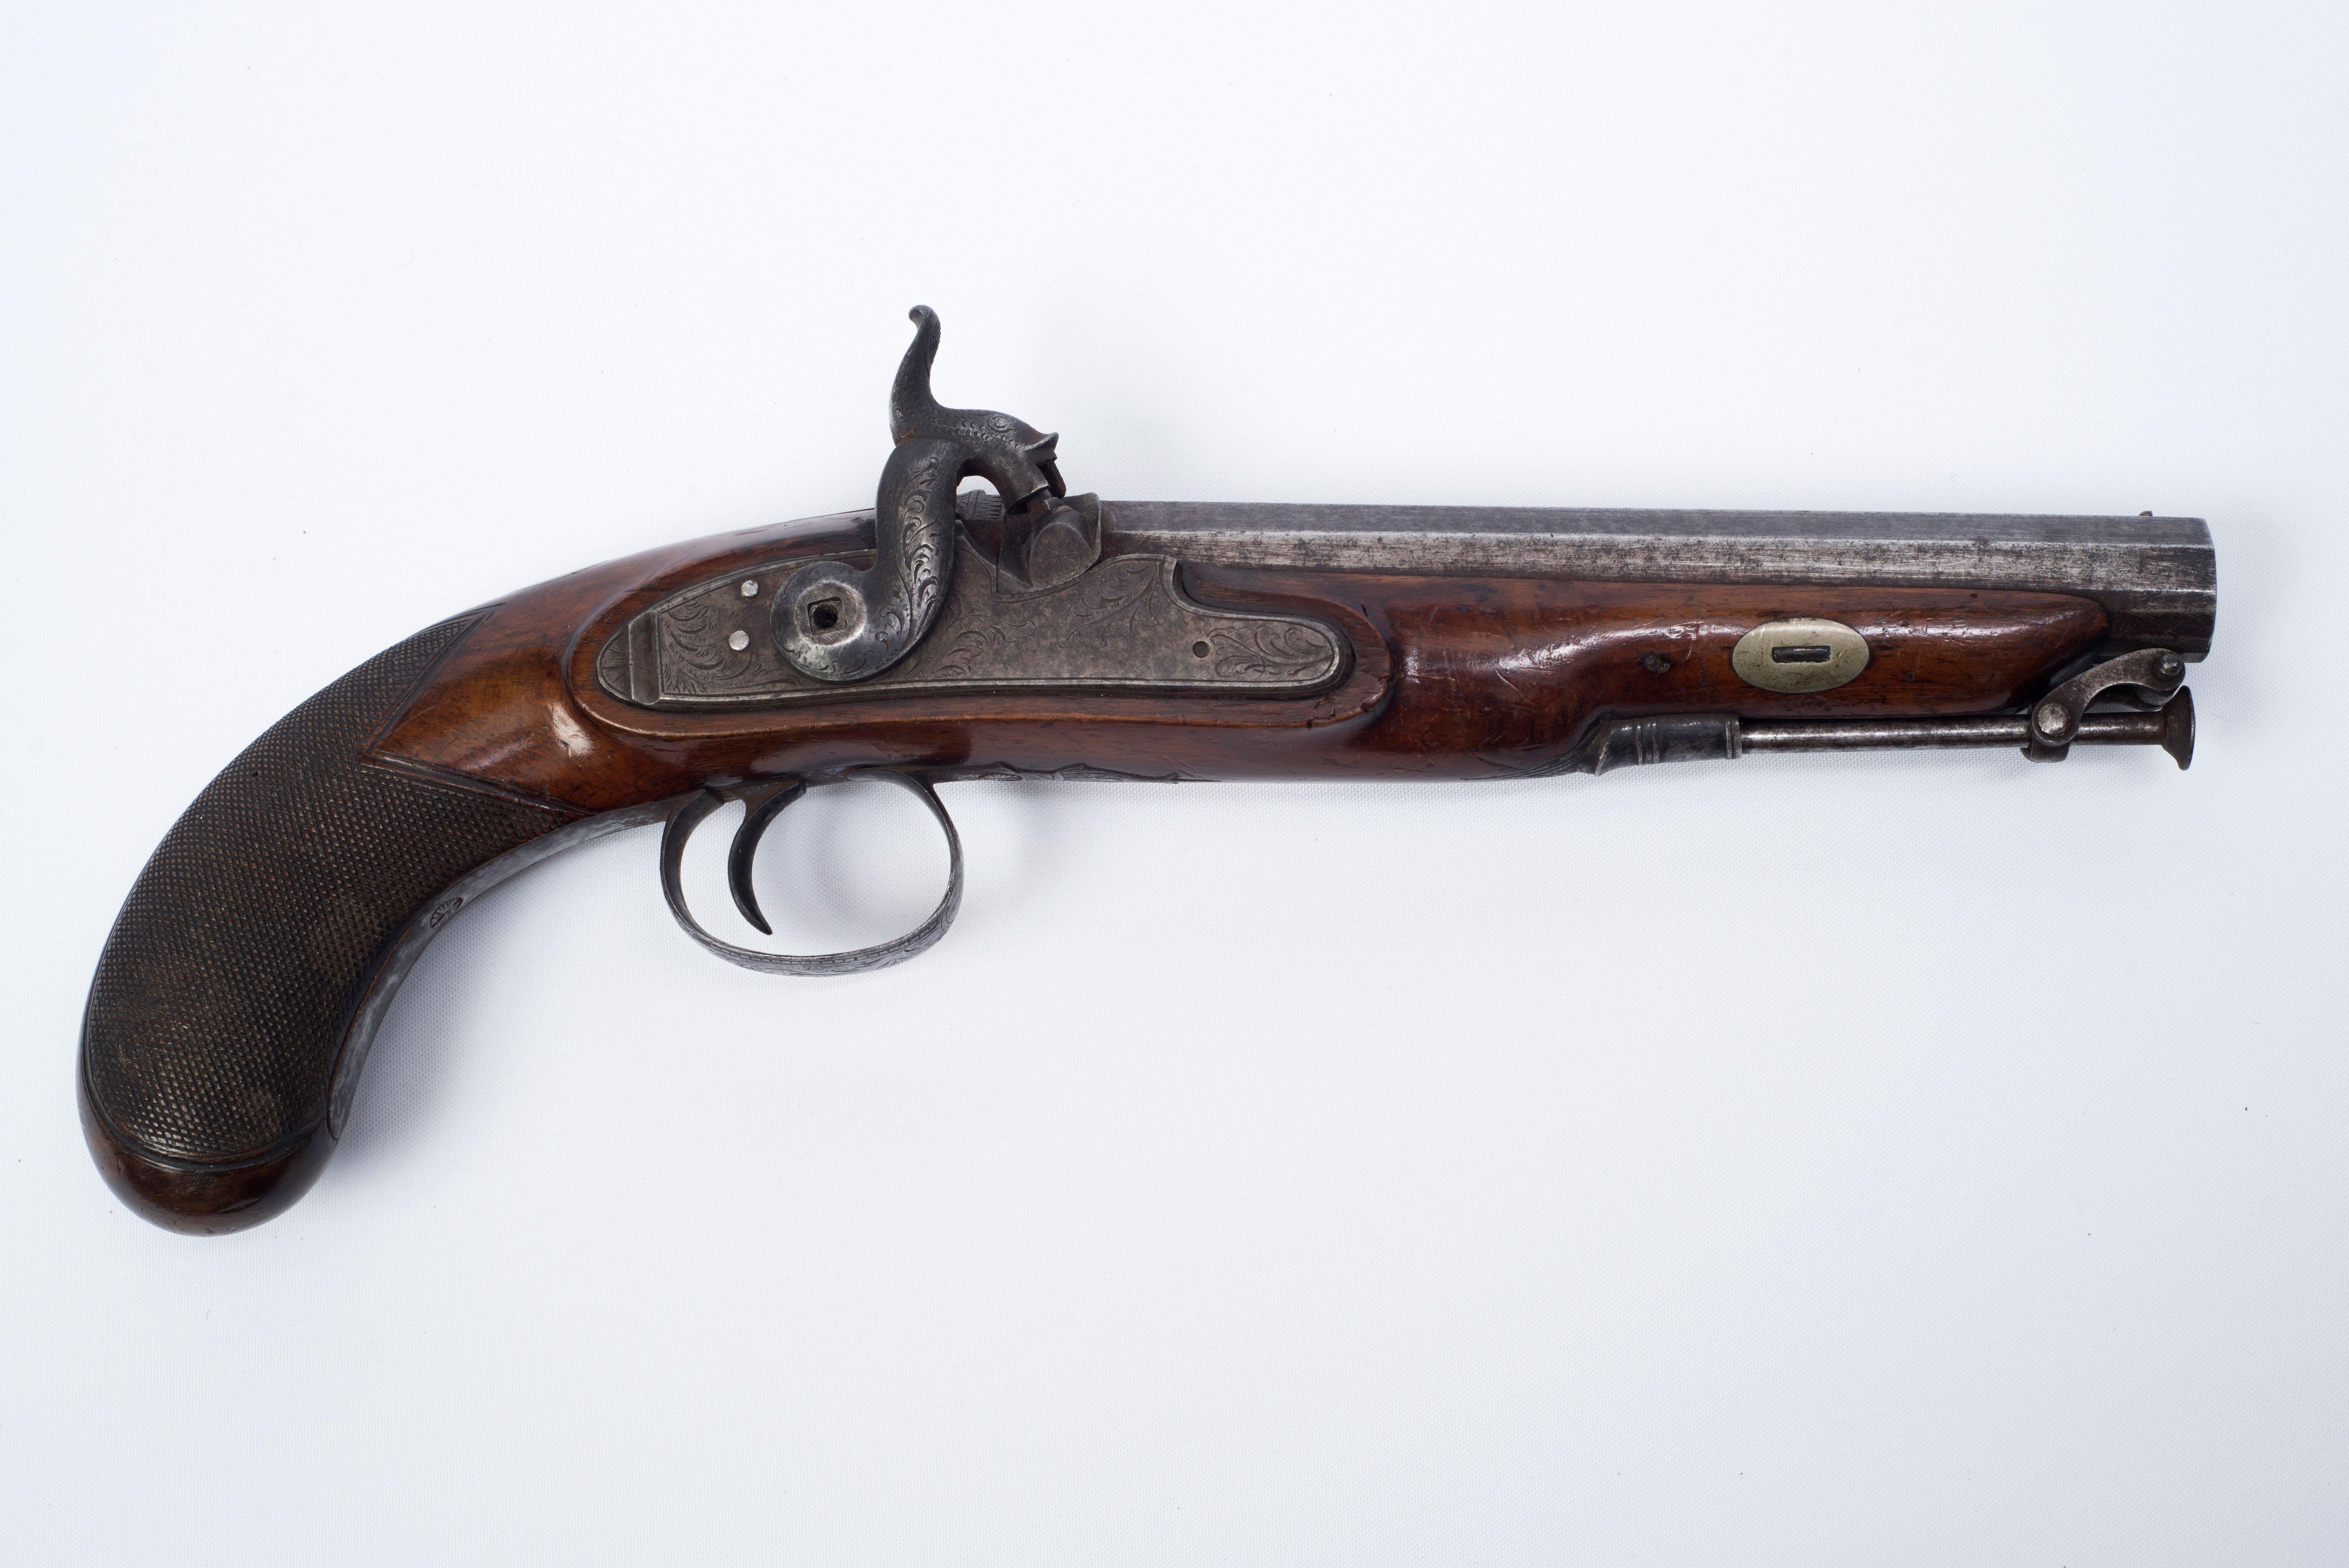 Holster Pistol – East Grinstead Museum